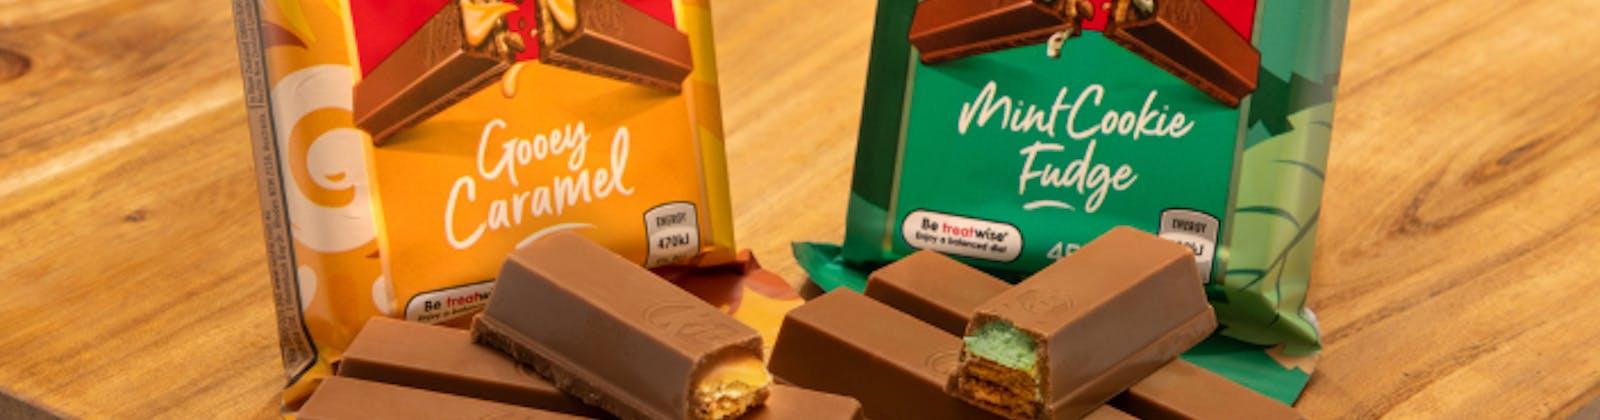 Gooey caramel and mint cookie fudge kitkats